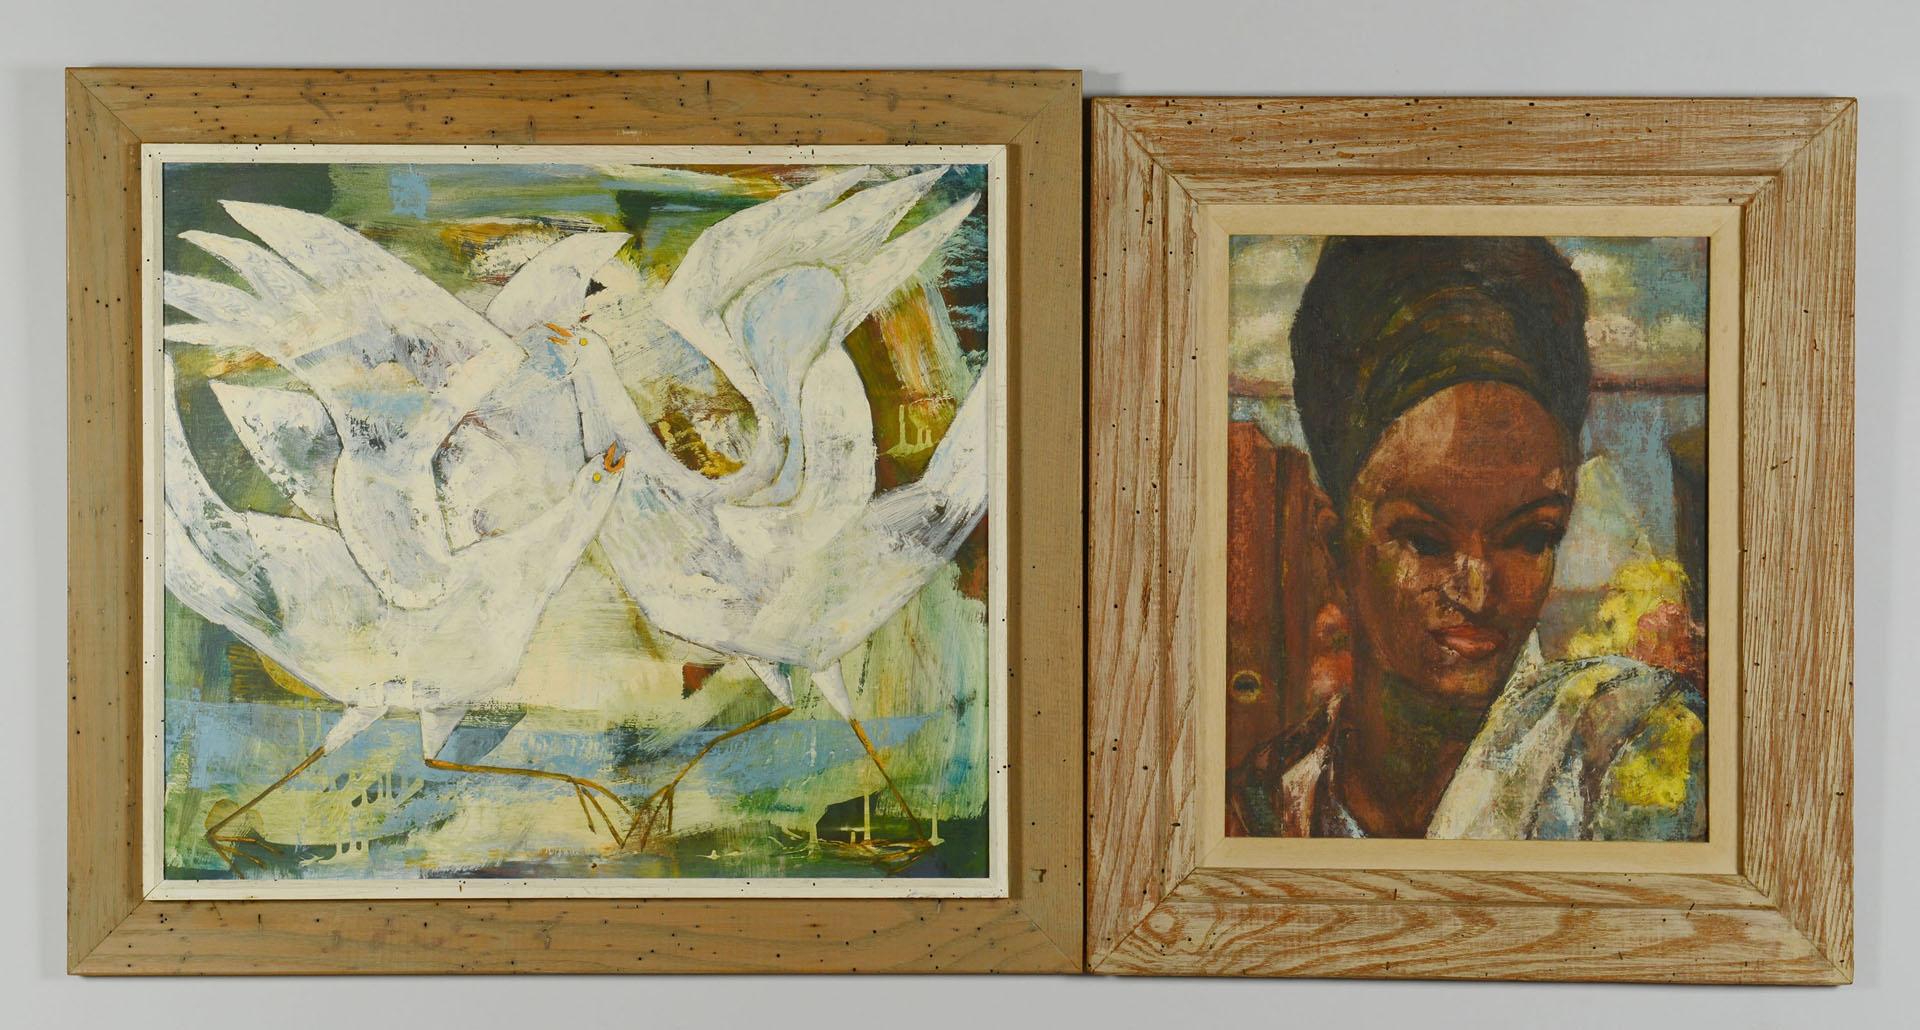 2 Irene C. Simms (TN) Oils, Wormy Chestnut Frames